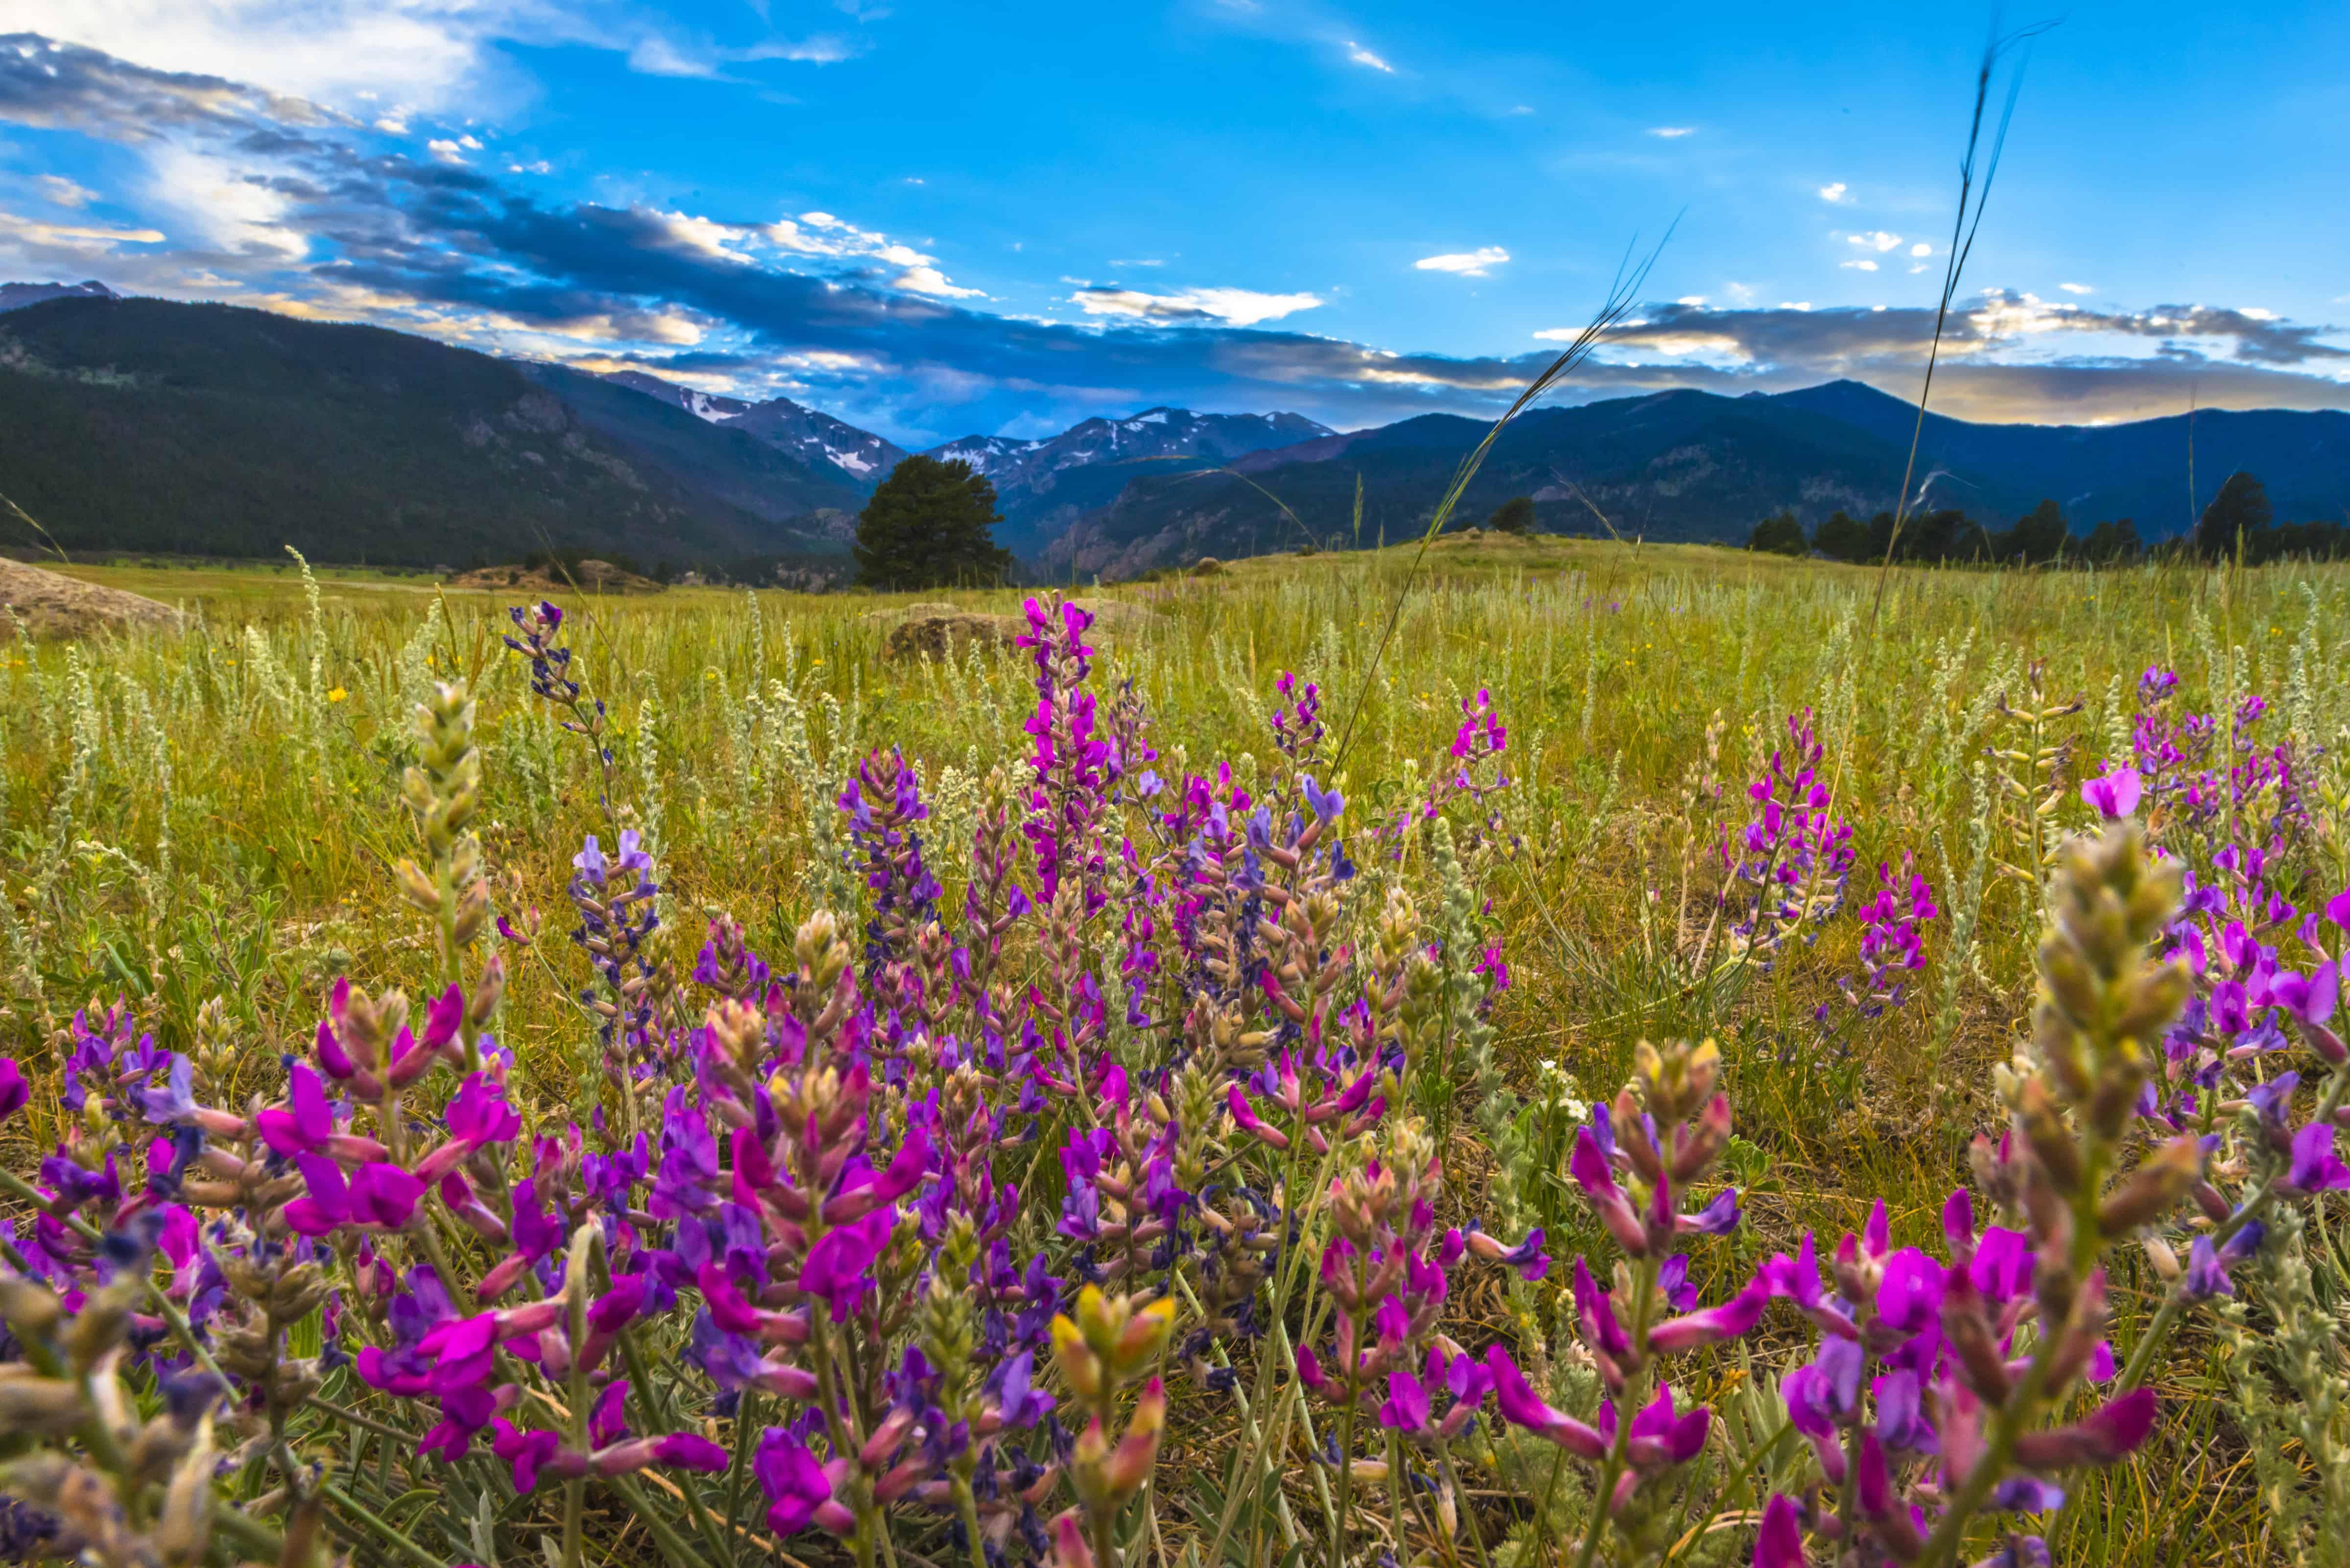 Indian Paintbrush flowers at sunset on Estes Park hiking trails near Moraine Park- Rocky Mountain Colorado